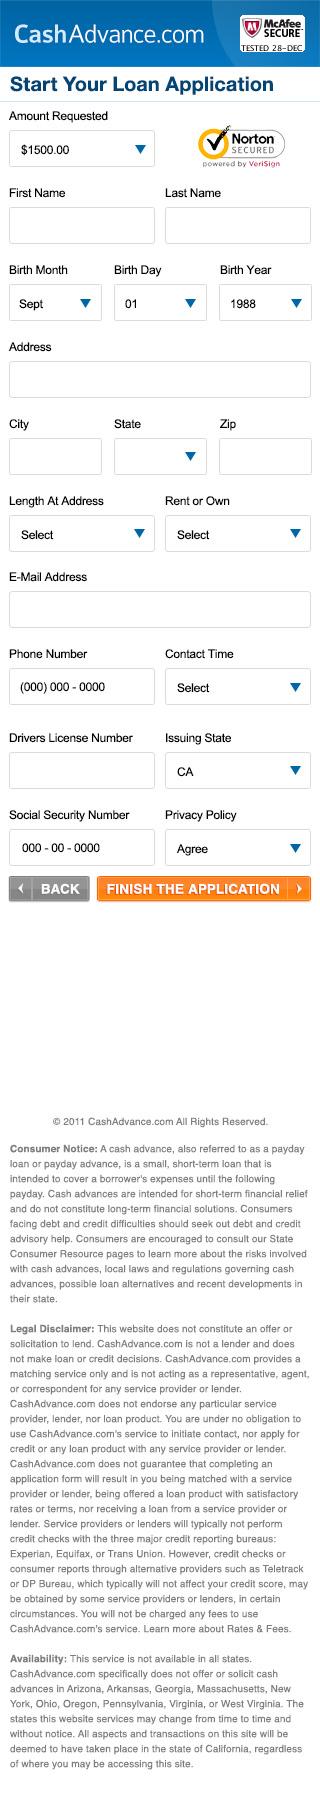 CashAdvance.com Apply Page